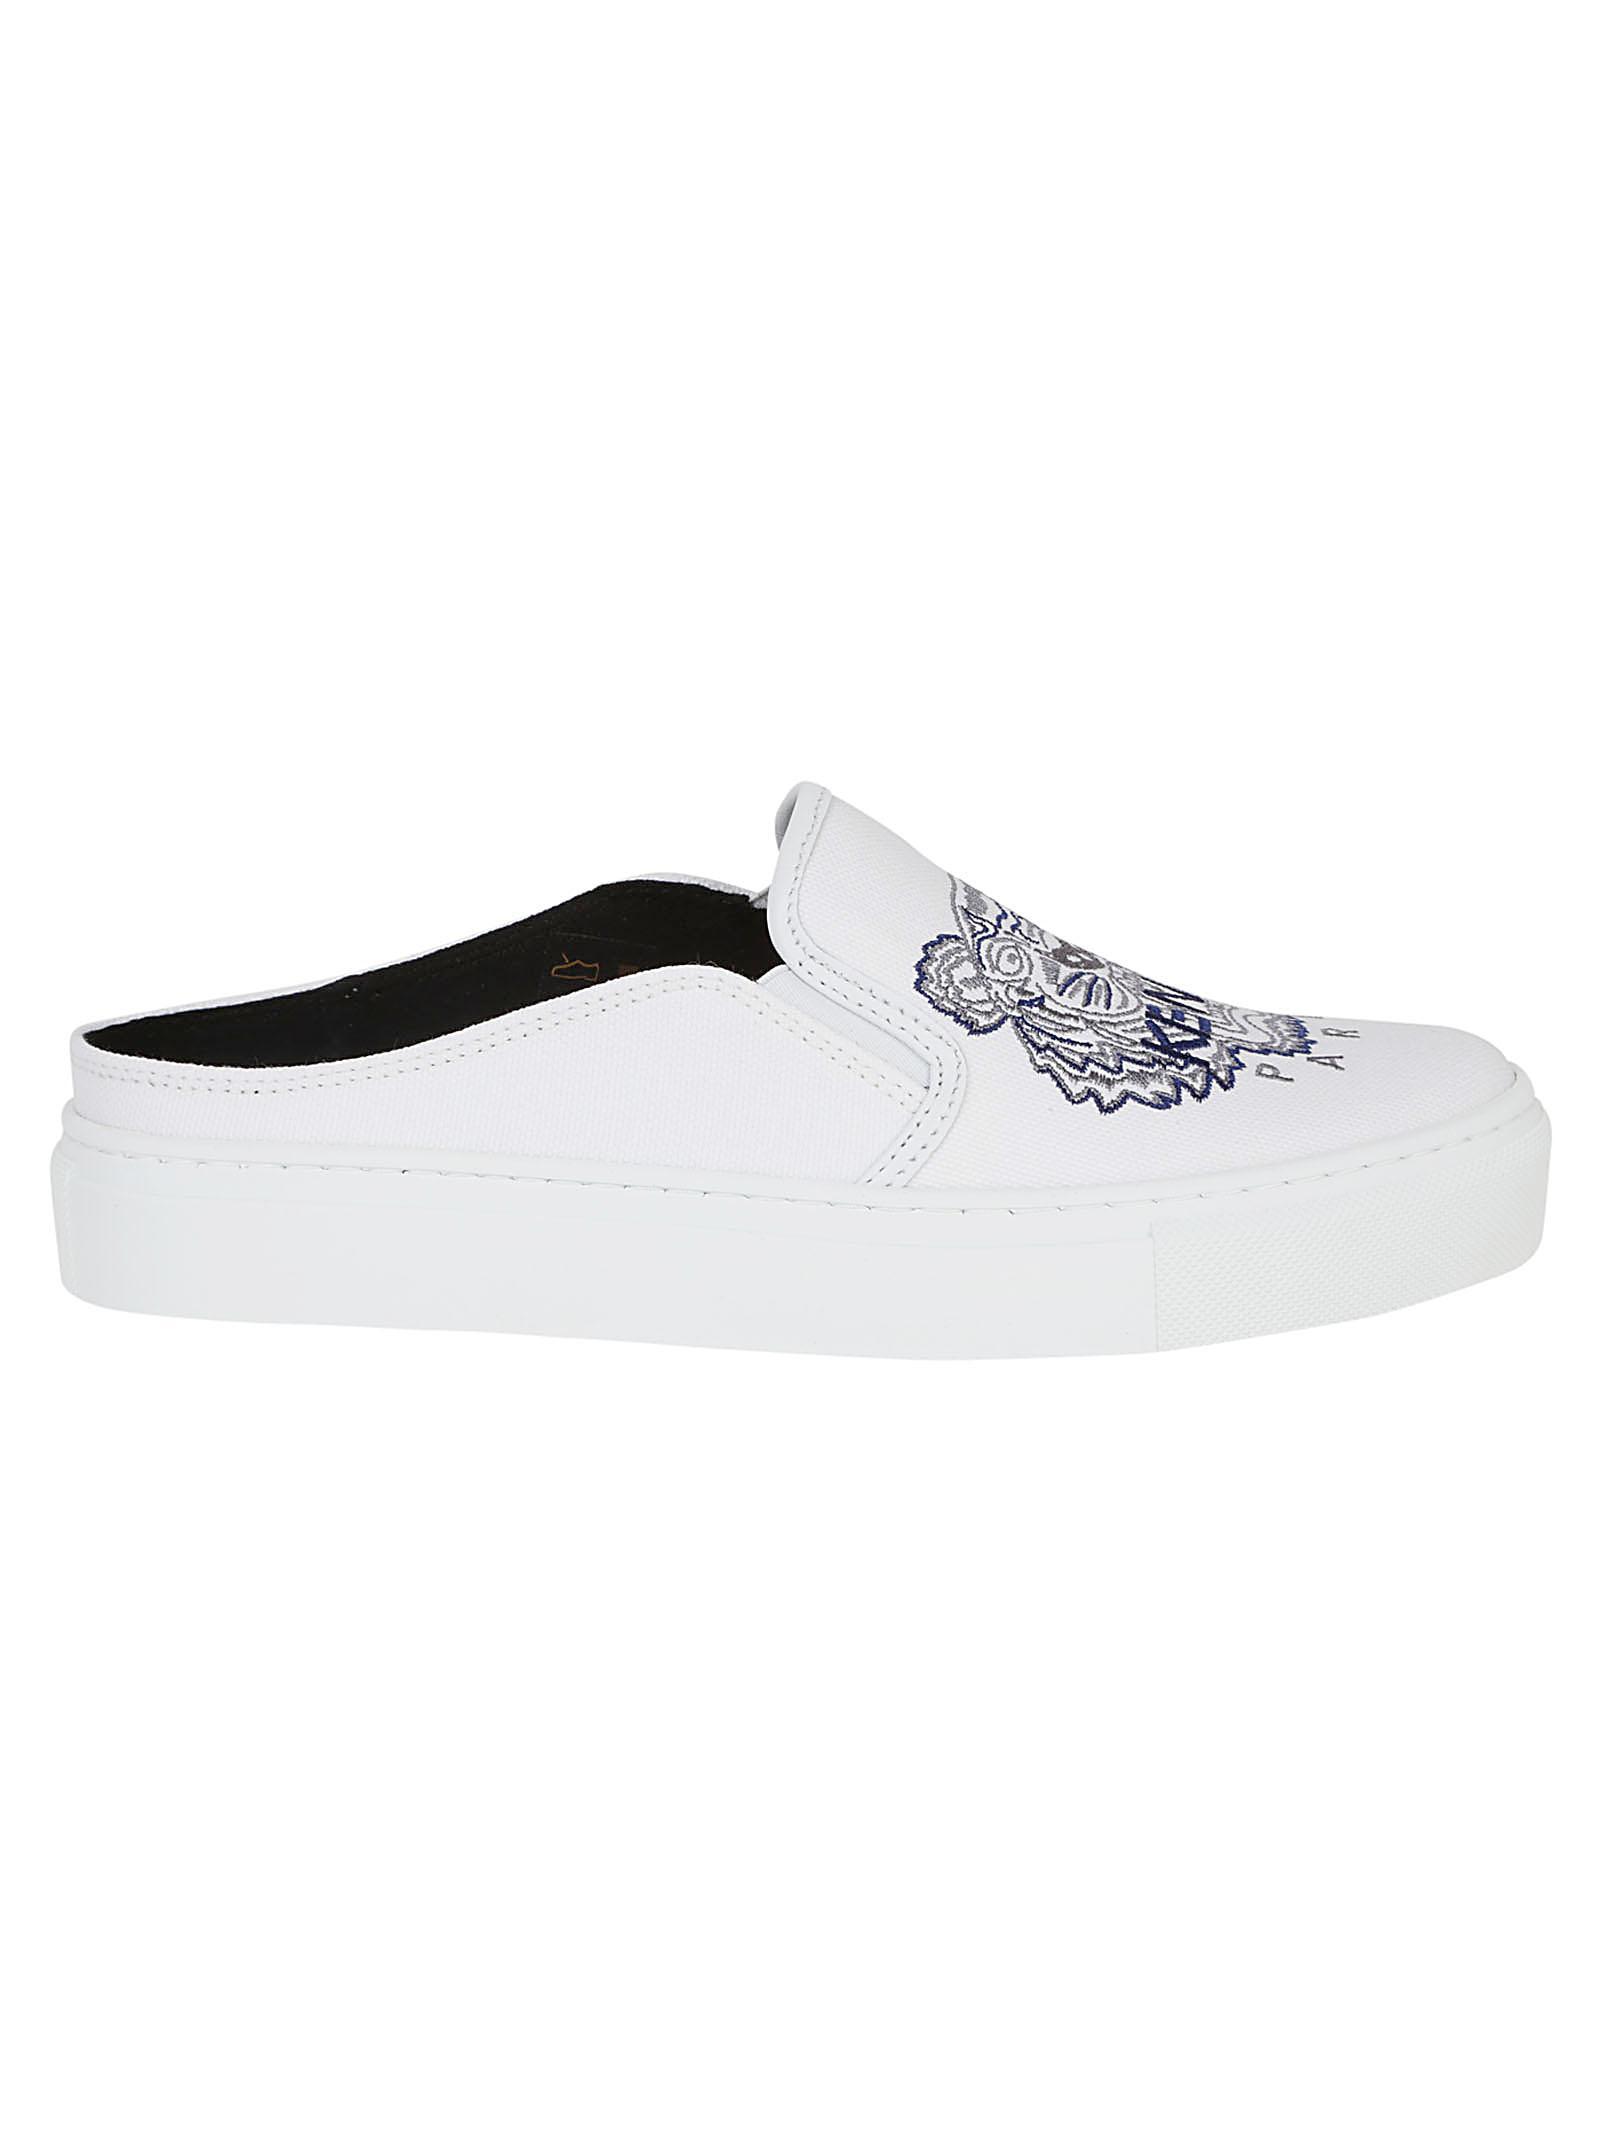 209d60c197 KENZO Multicolor K-skate Mule Sneakers Tiger